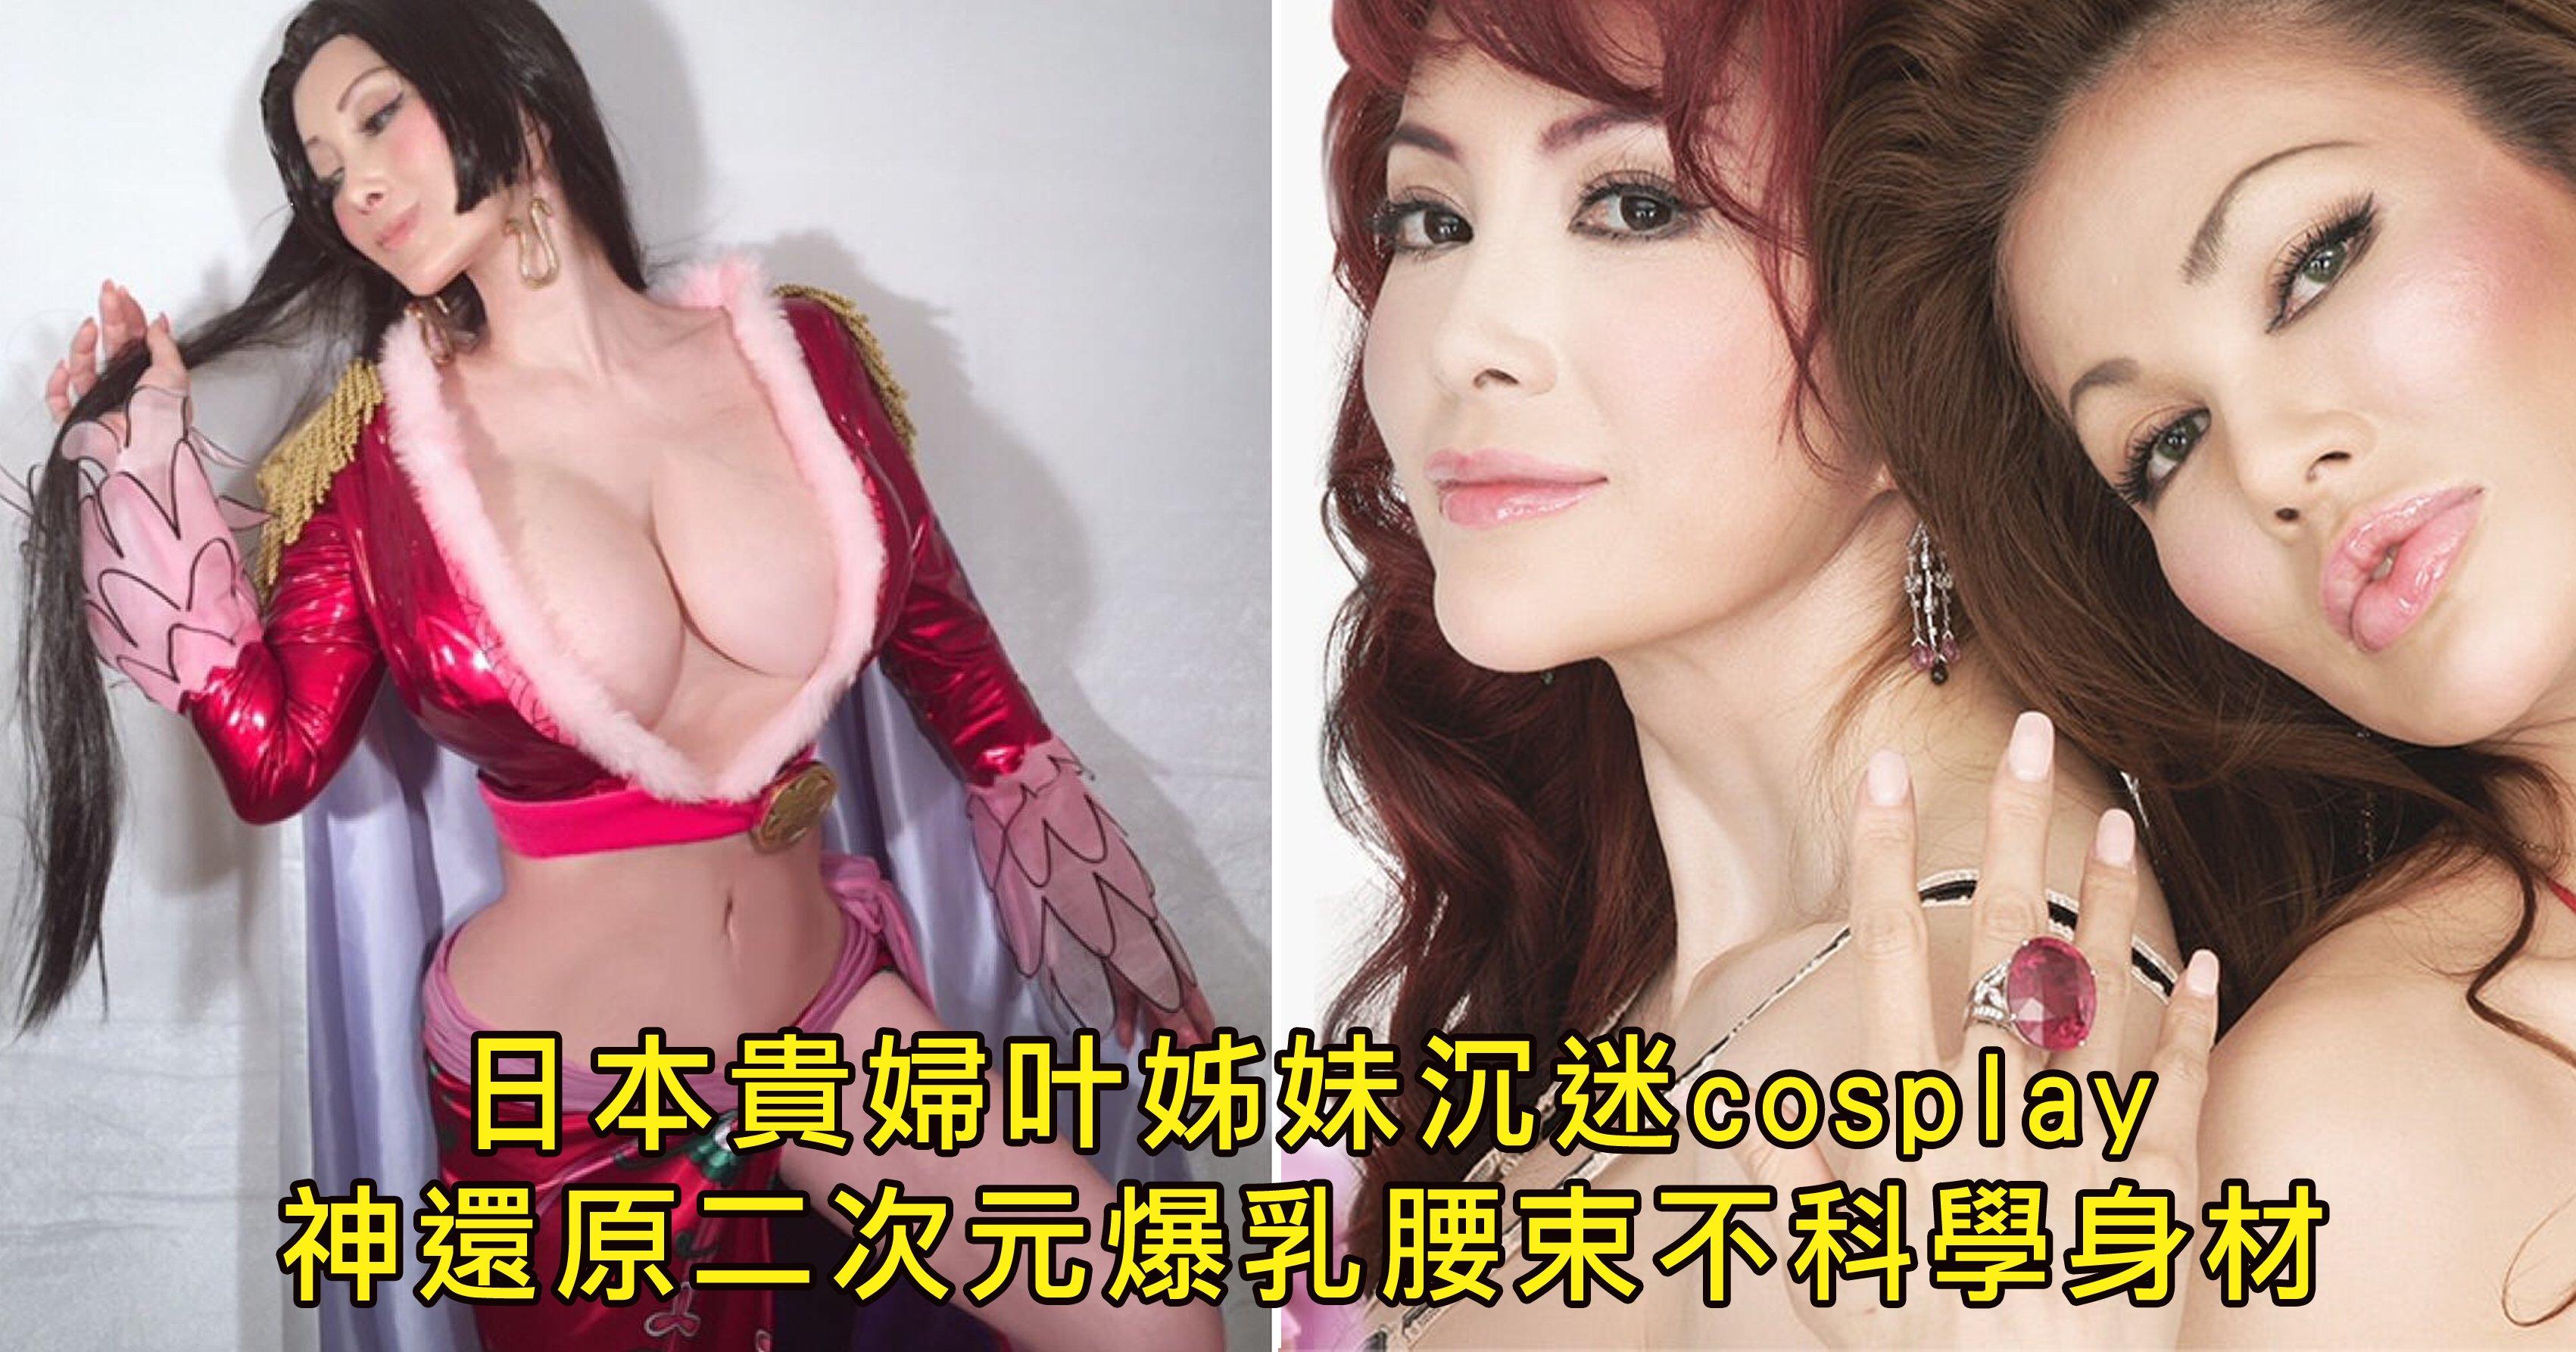 181029 216.jpg?resize=412,232 - 這才是真正的蛇姬!日本貴婦迷上cosplay,神還原二次元爆乳身材